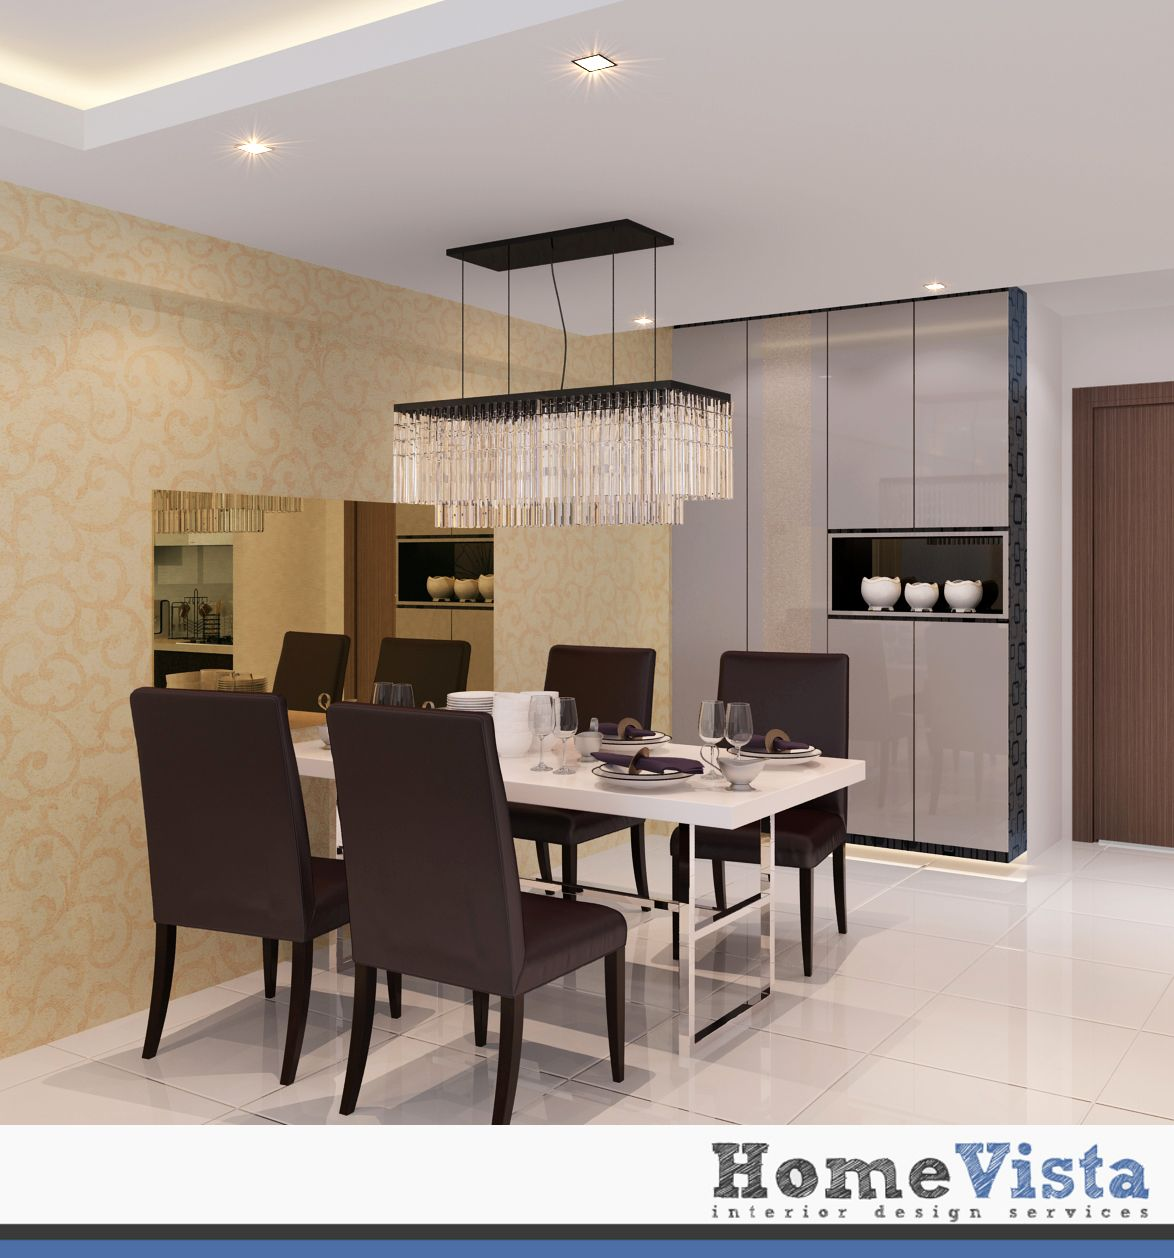 4 room BTO - Yishun HDB BTO - HomeVista | Dining Room design ideas ...